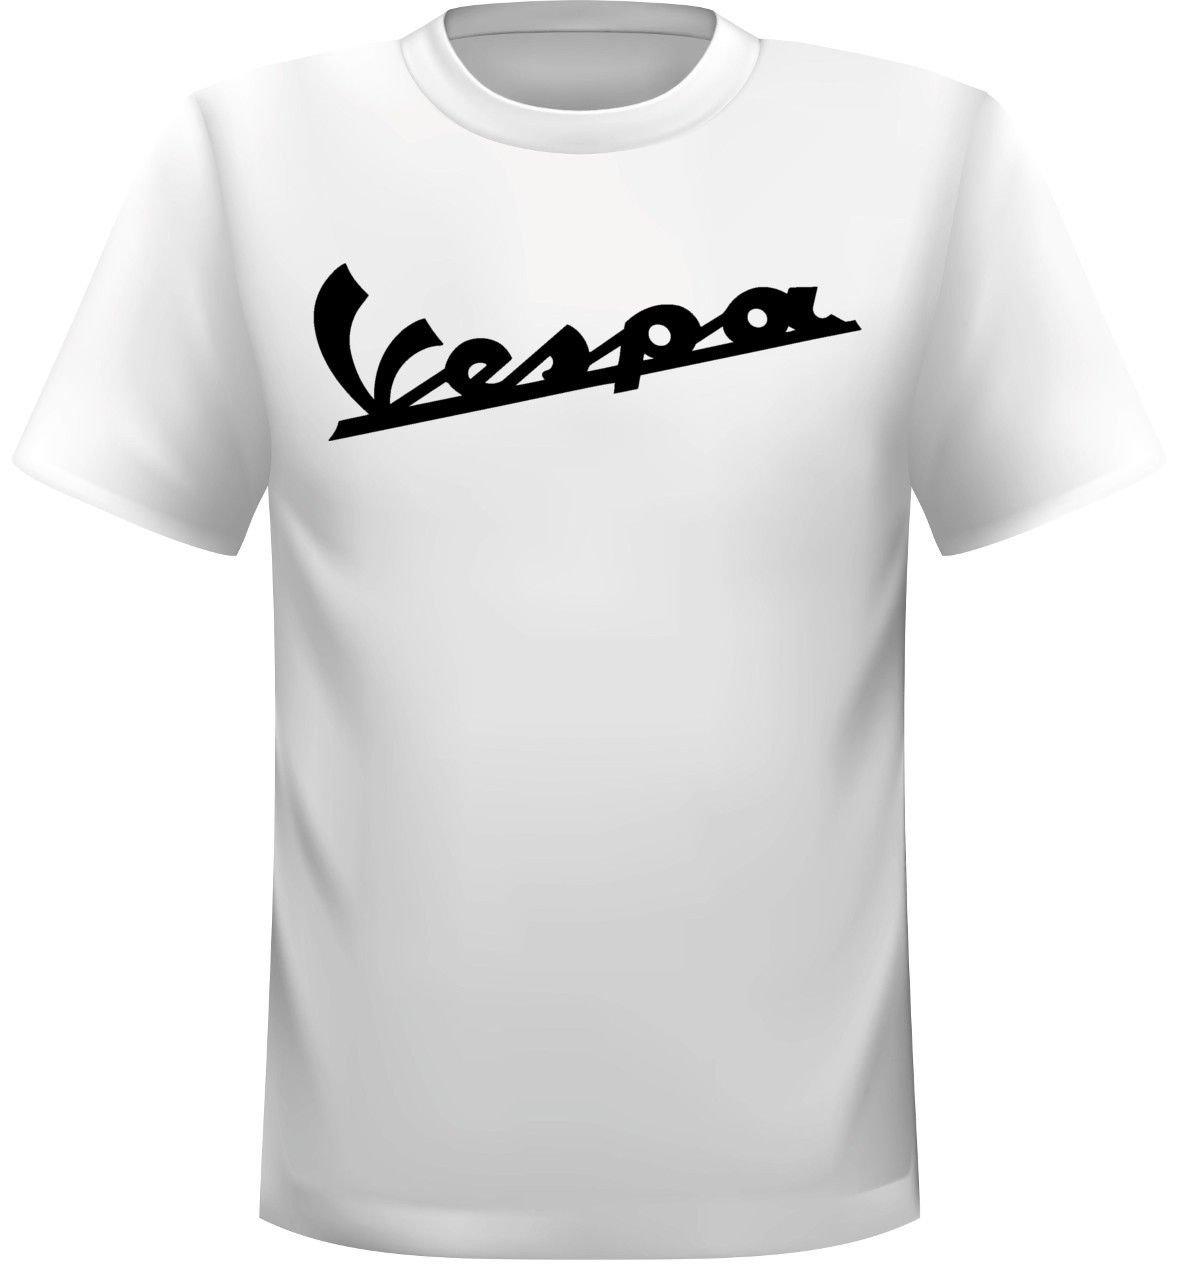 Camiseta de Vespa con texto Streetwall